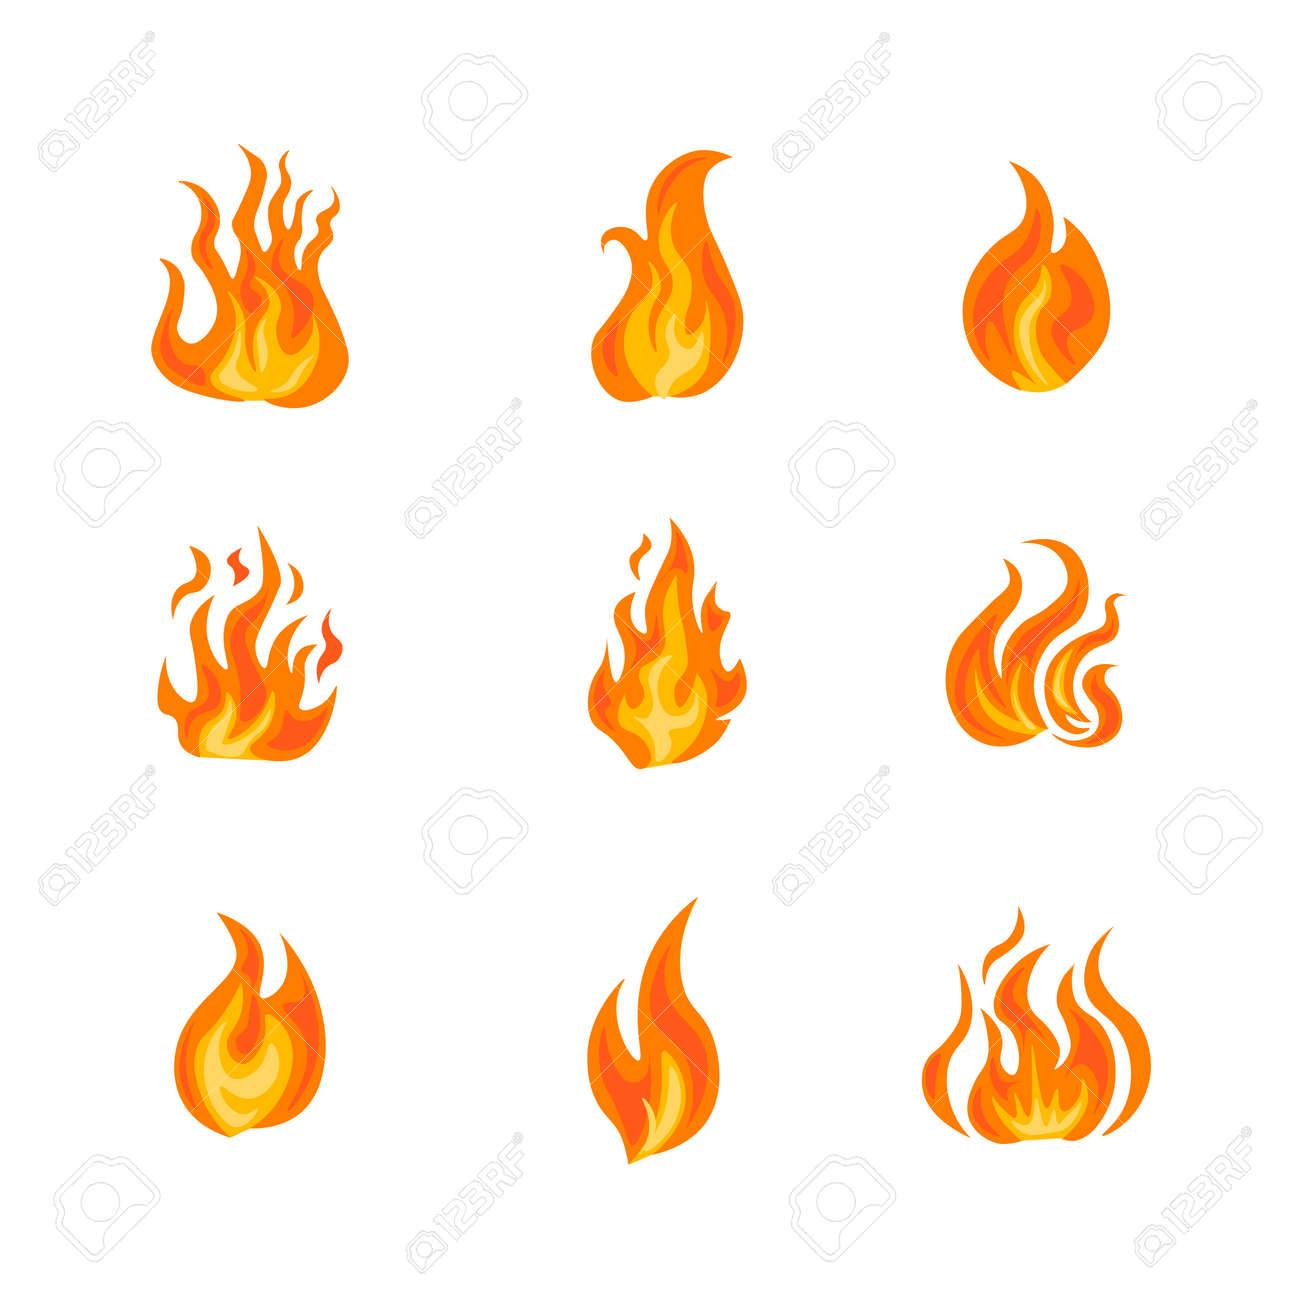 Fire frame icon set illustration - 141373340